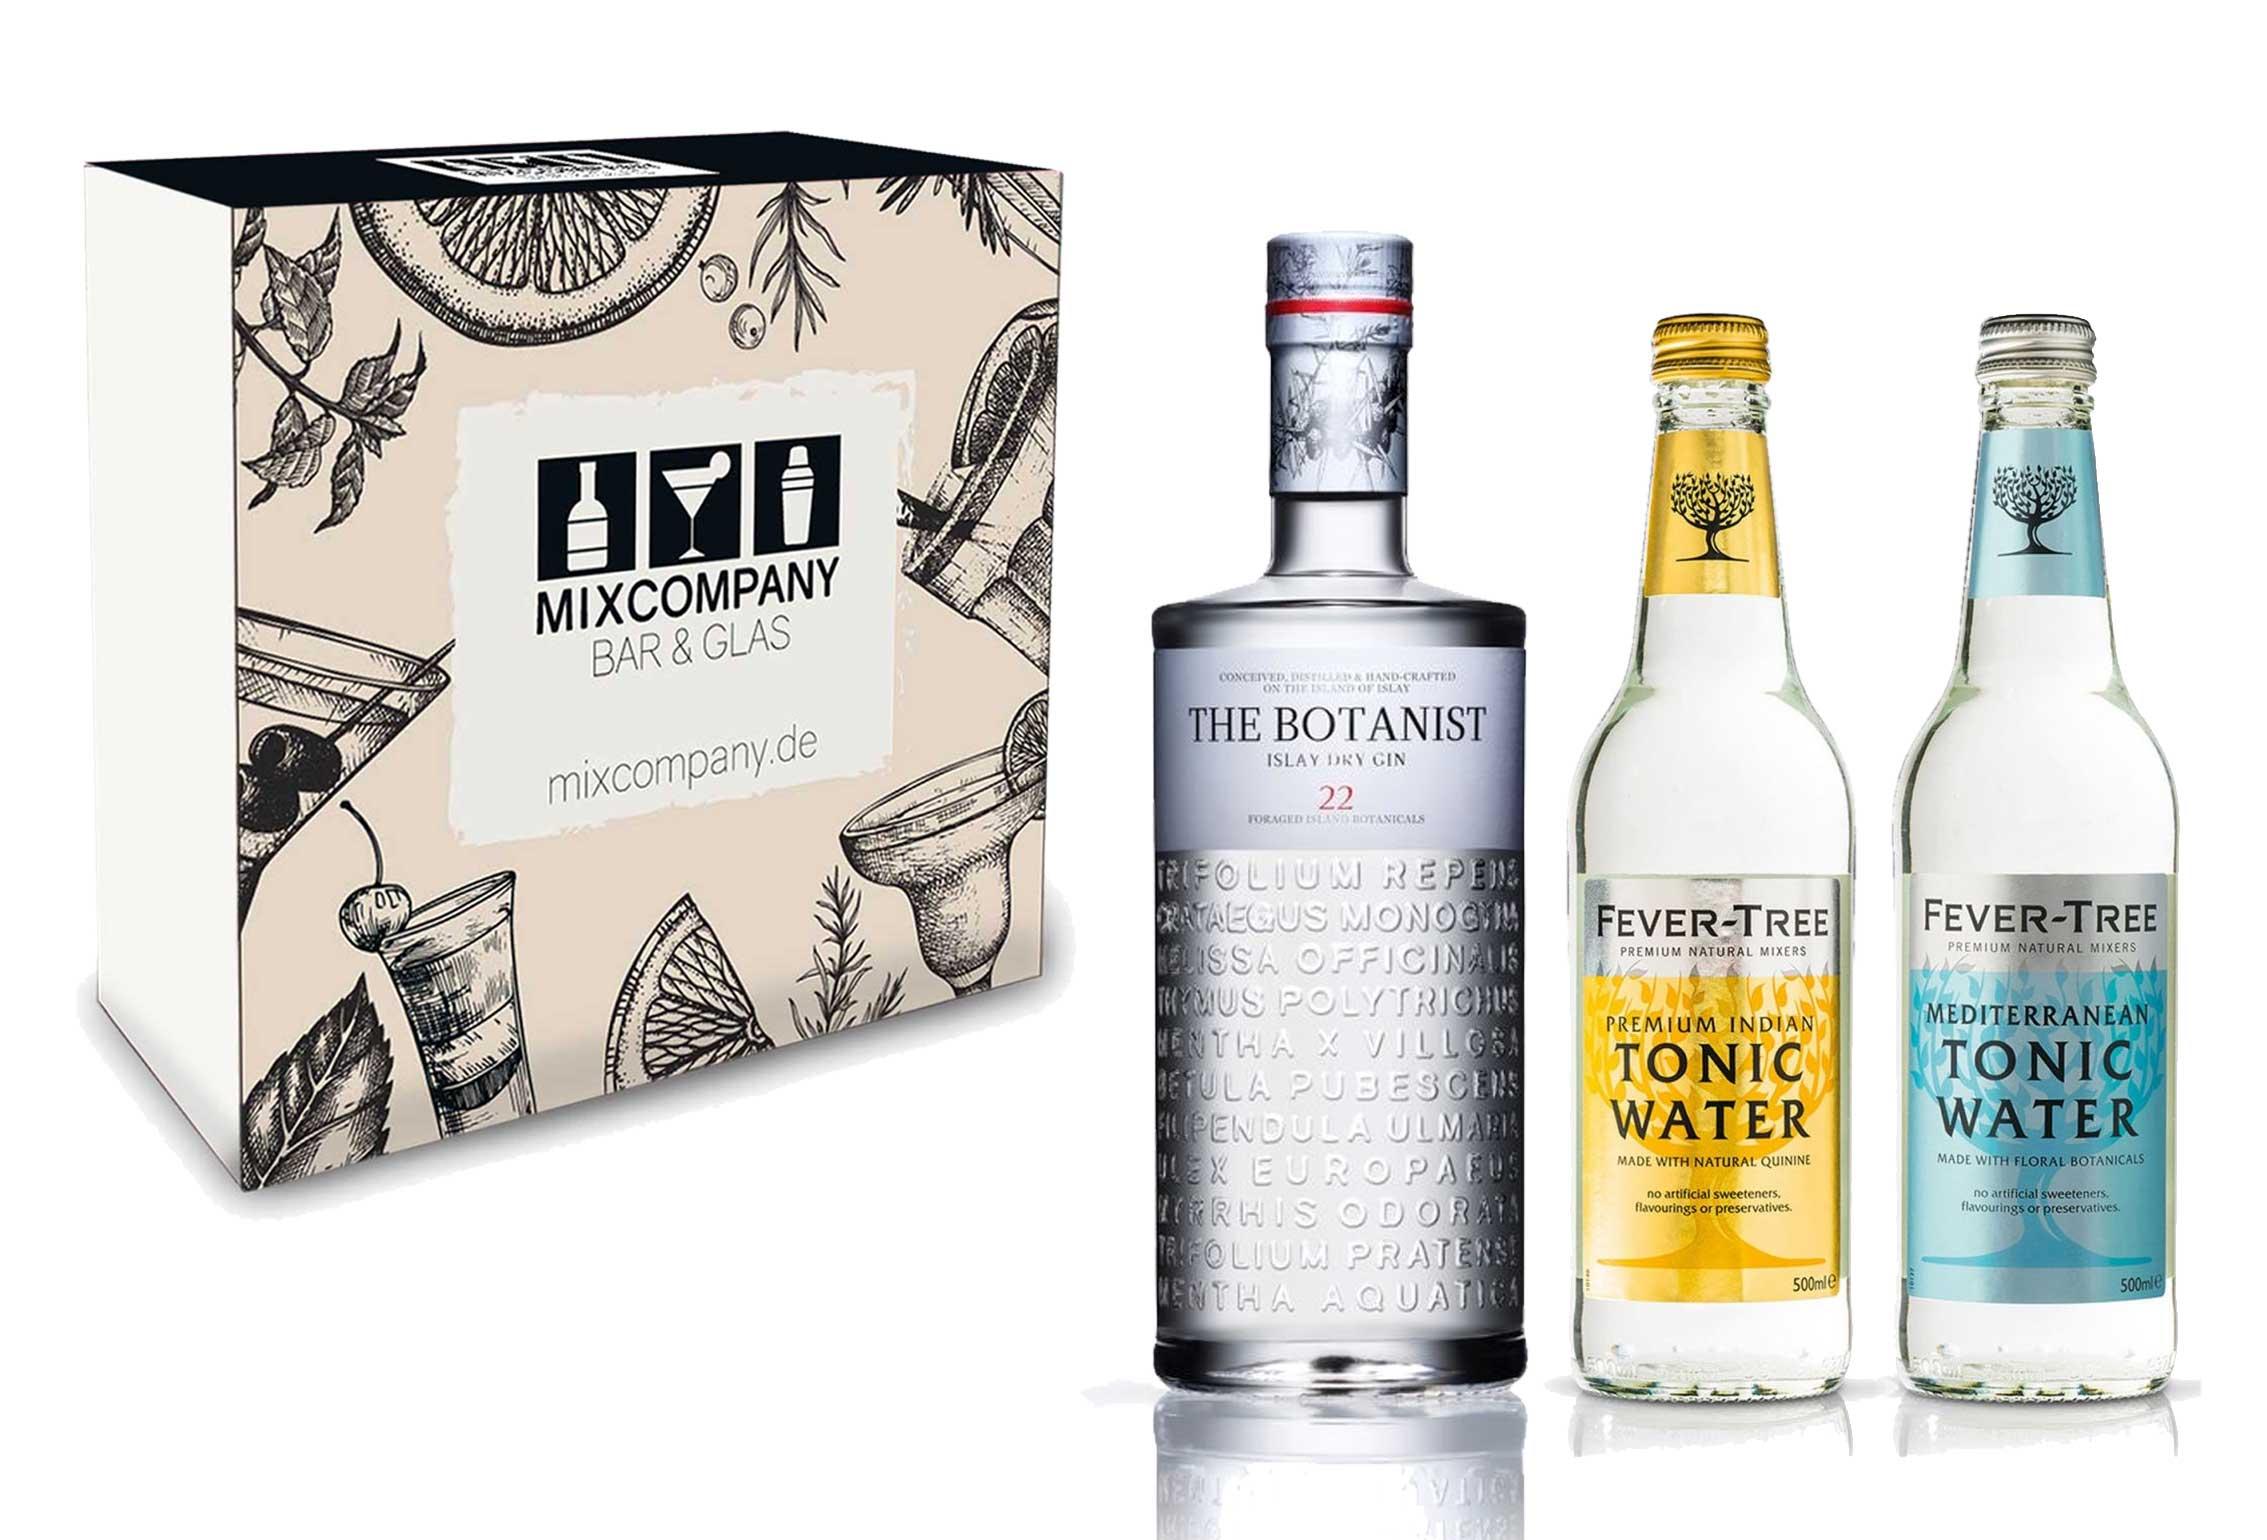 Gin Tonic Set Geschenkset - The Botanist Islay Dry Gin 0,7l 700ml (46% Vol) + 2x Fever Tree Tonic Water Mix je 500ml -[Enthält Sulfite] - Inkl. Pfand MEHRWEG